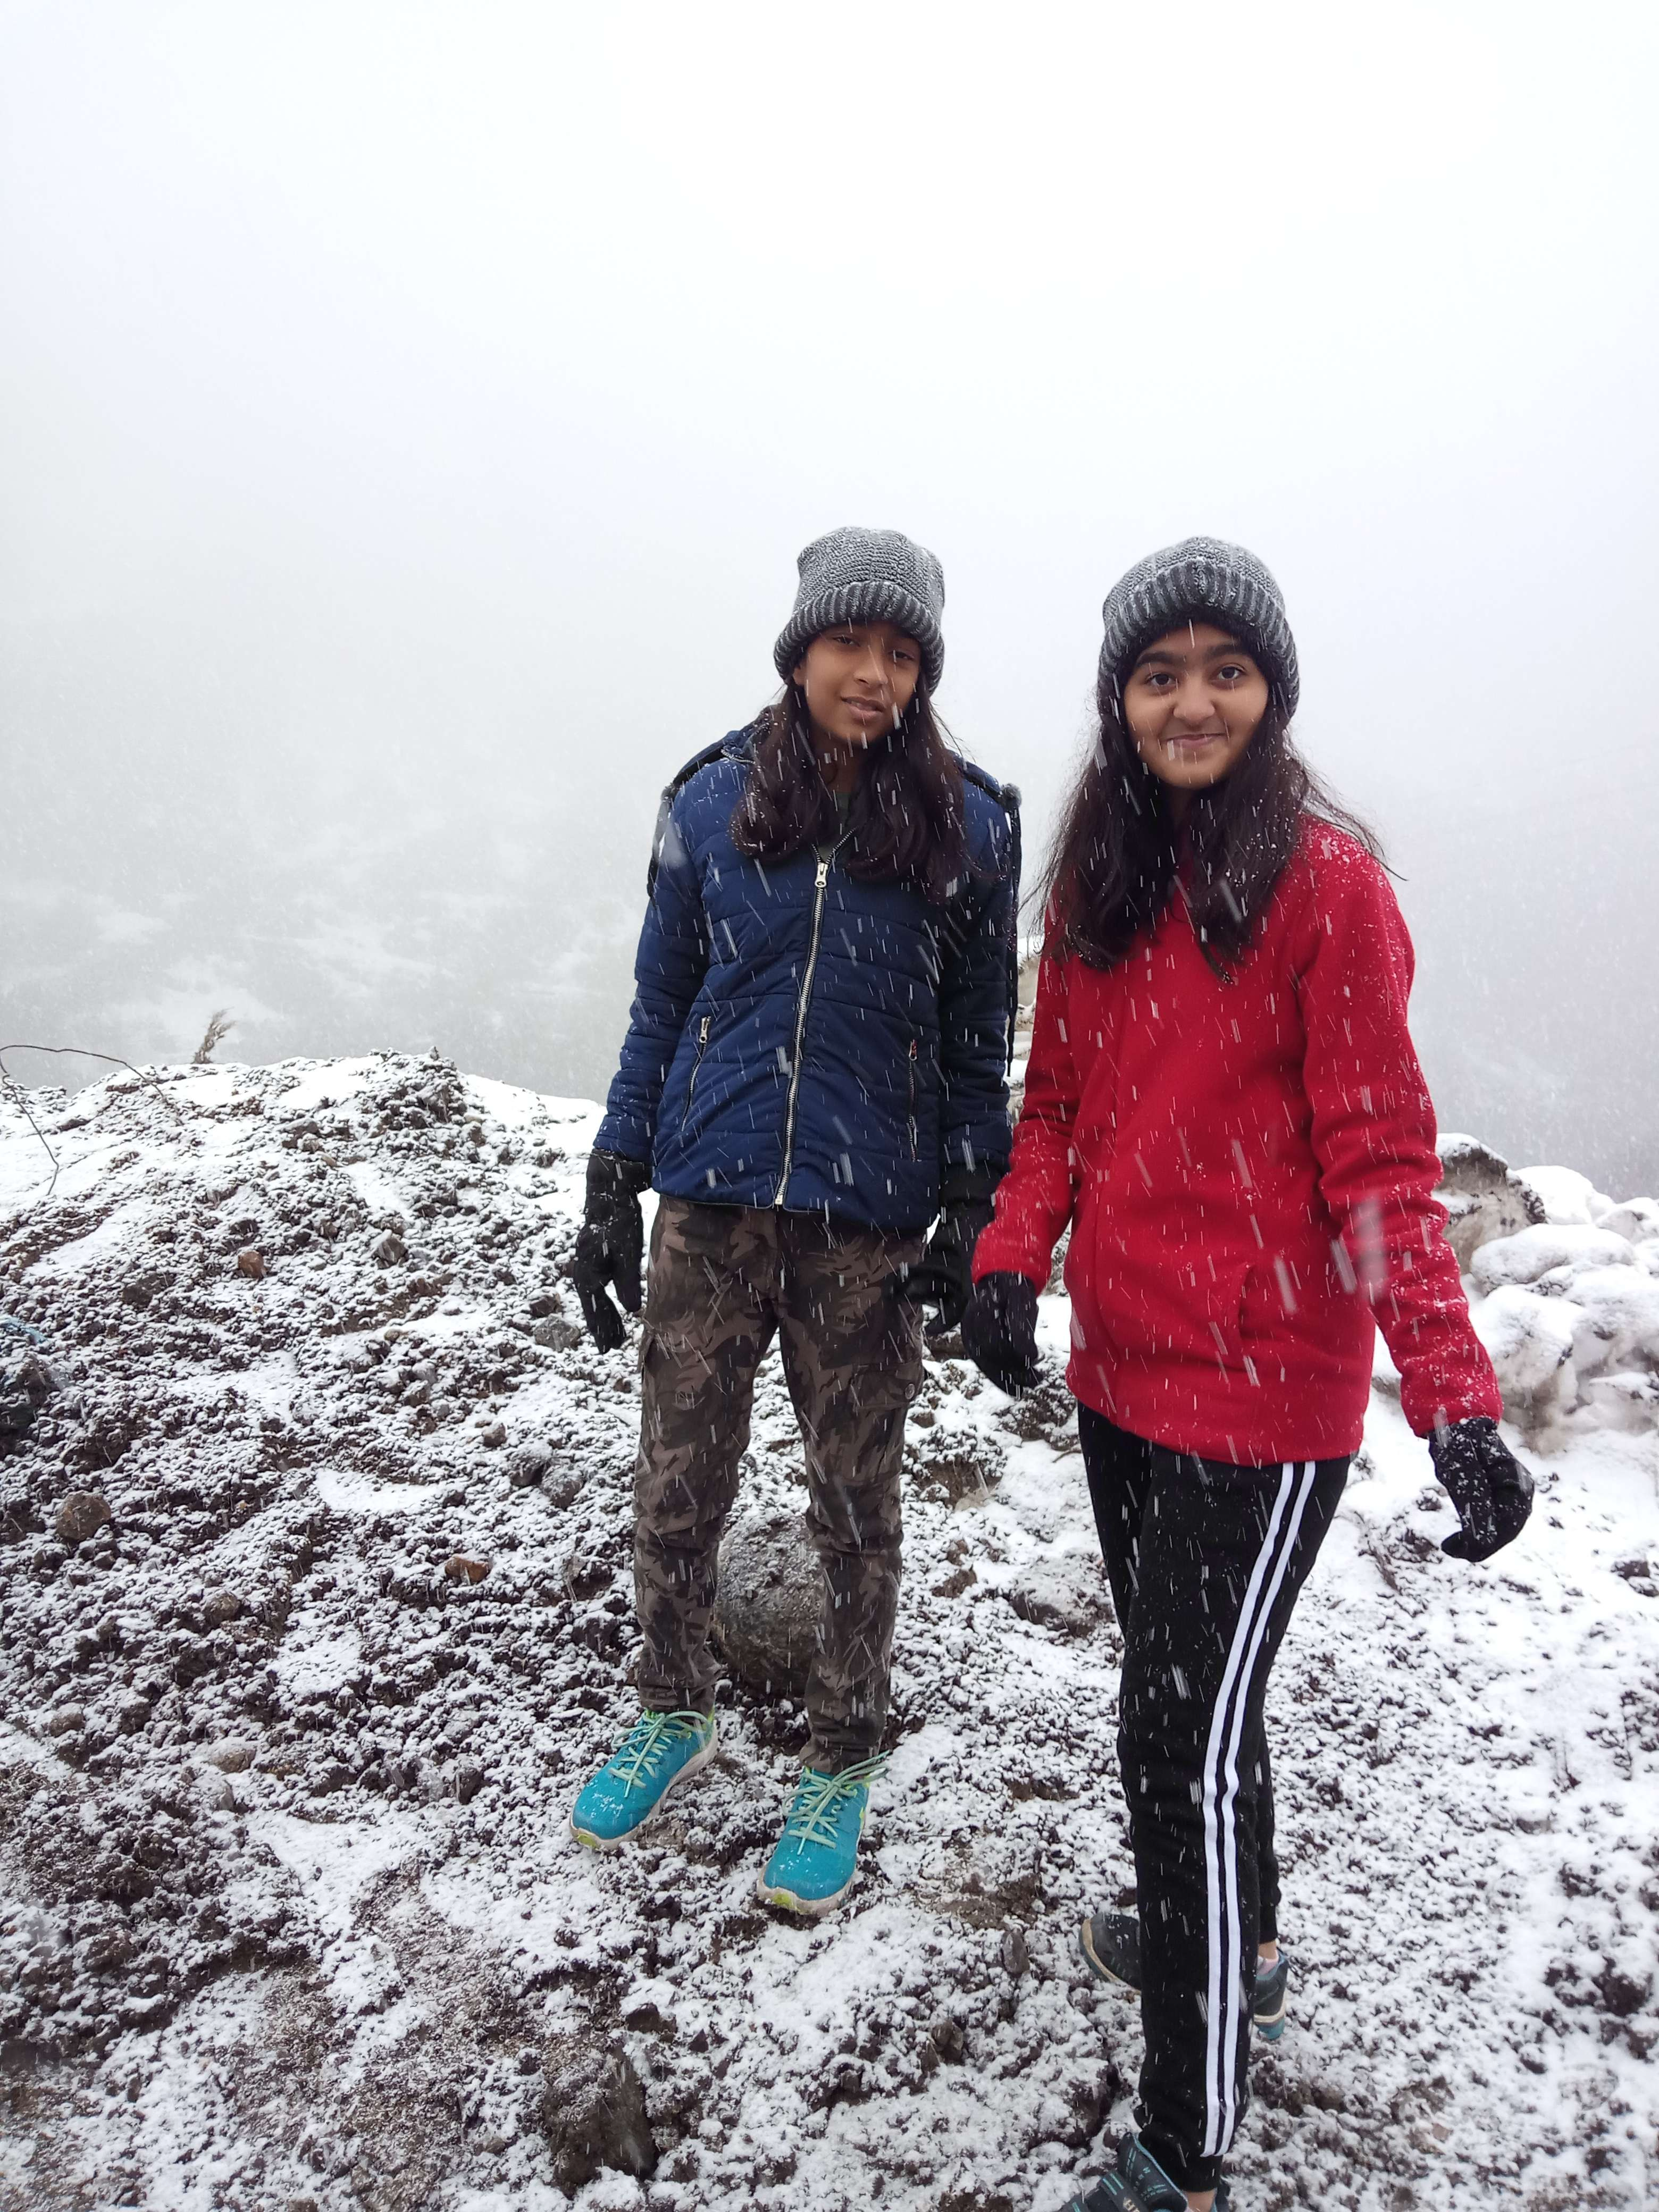 enjoying the snowfall